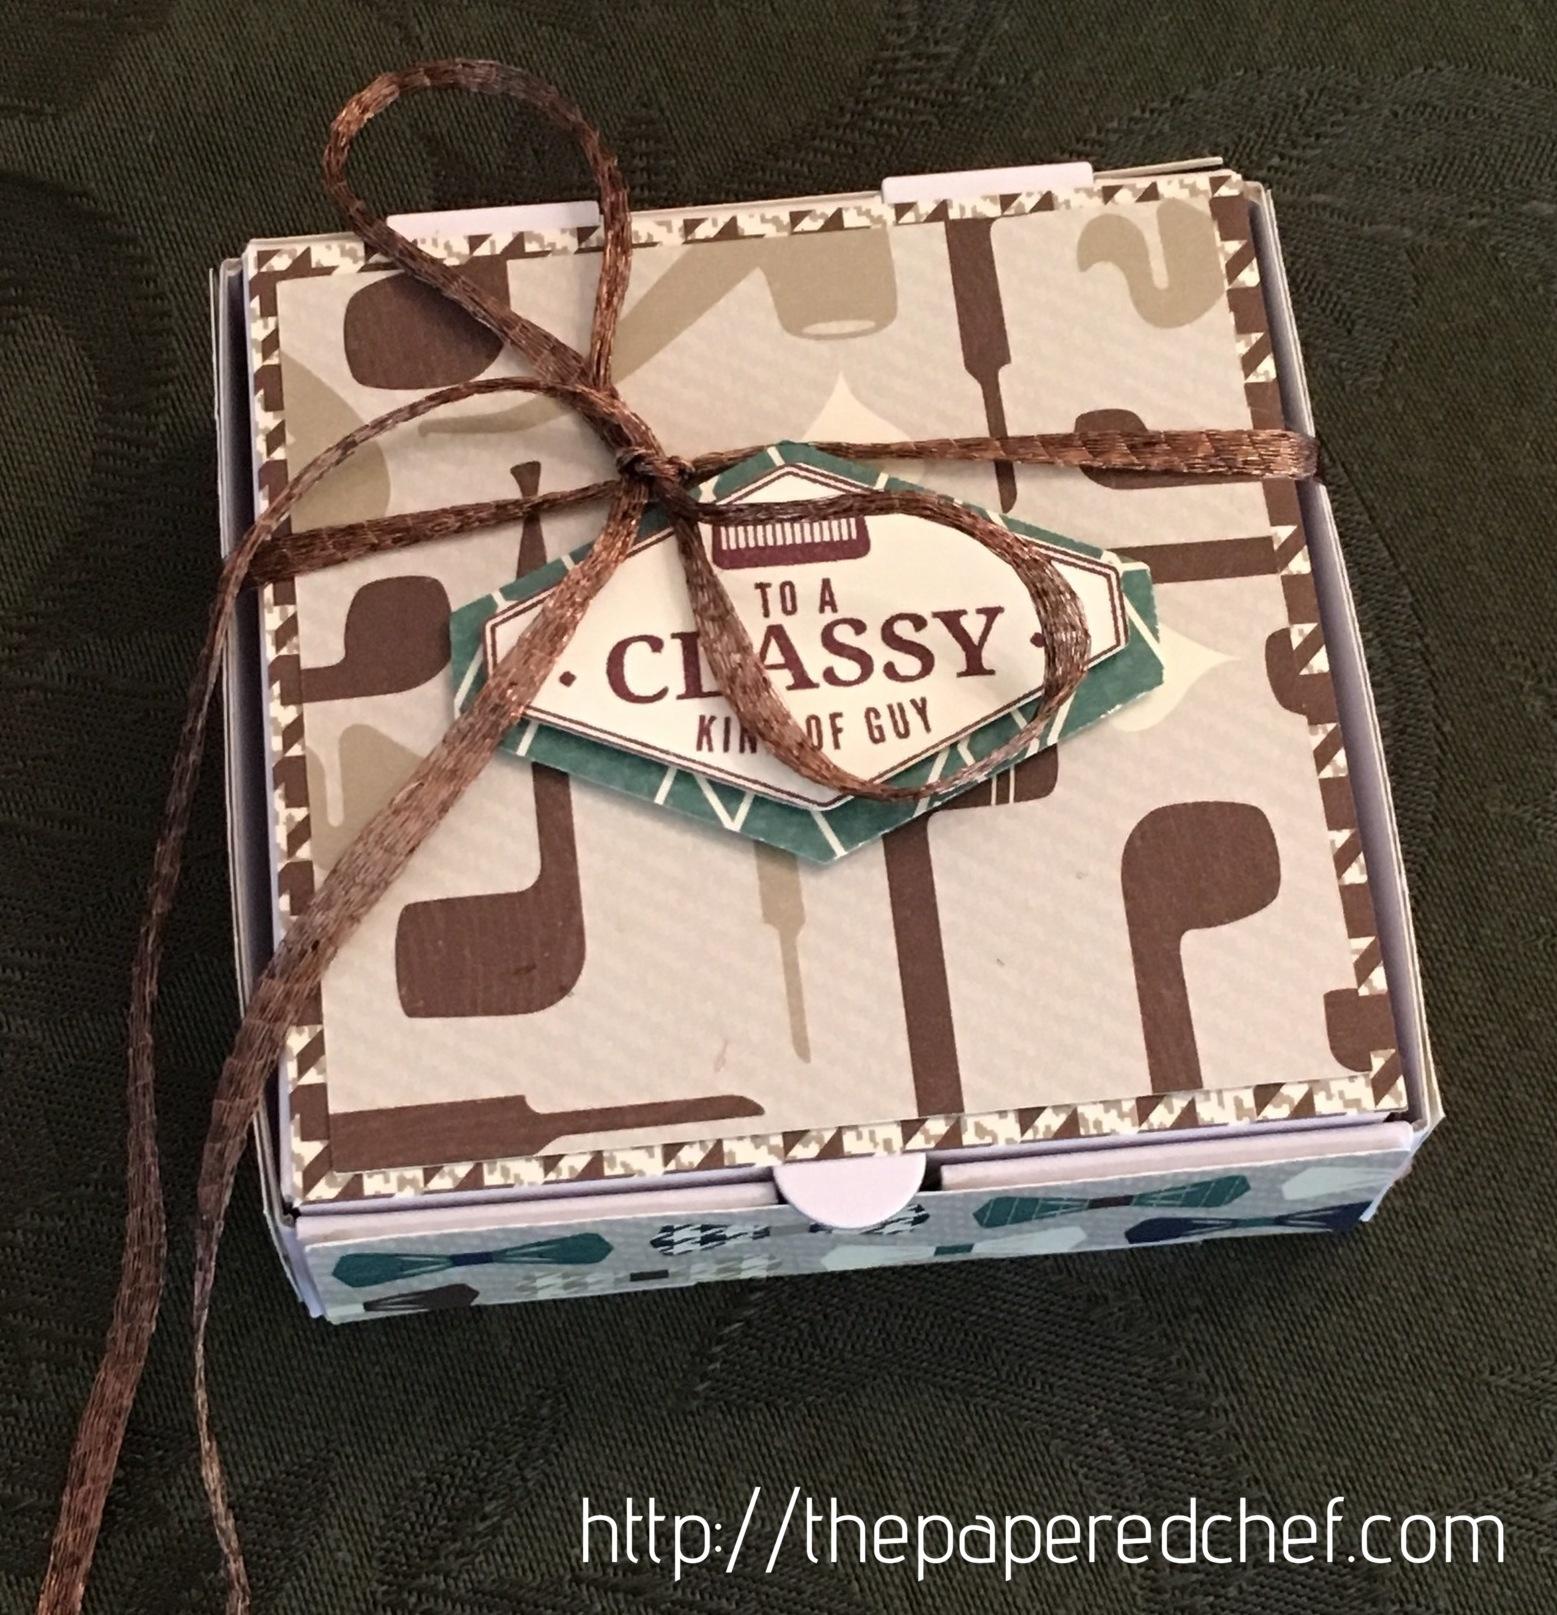 Classy Guy Mini Pizza Box - True Gentleman